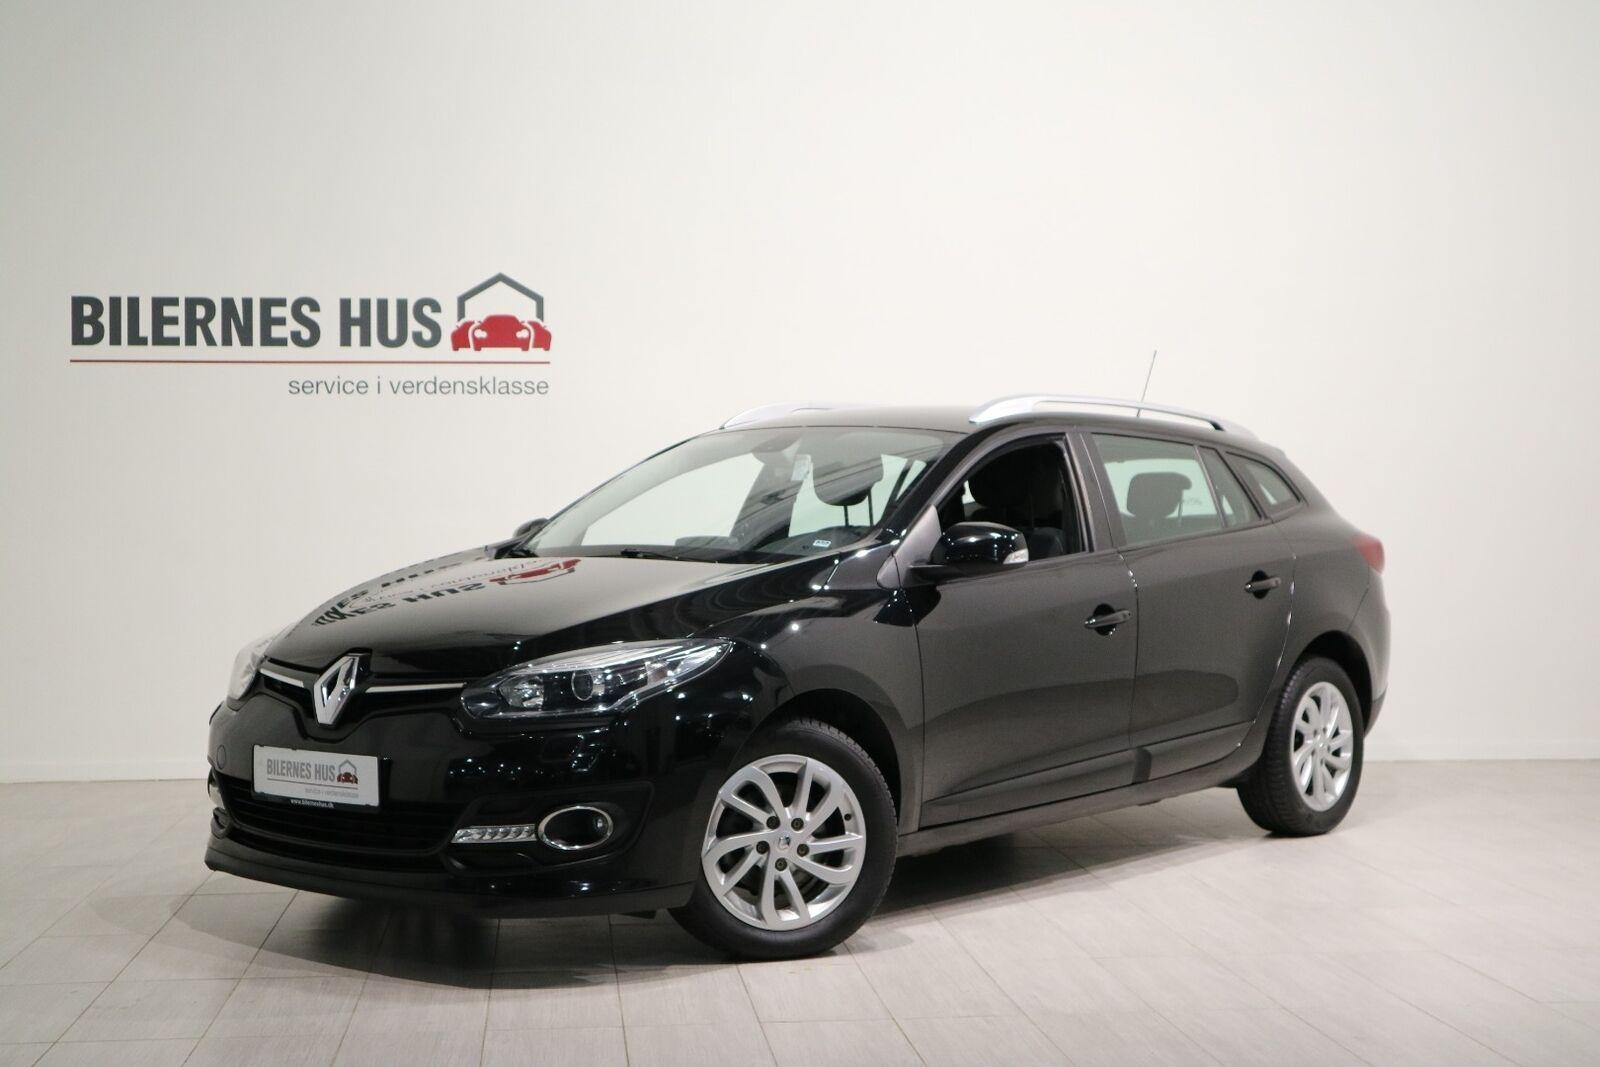 Renault Megane III Billede 1